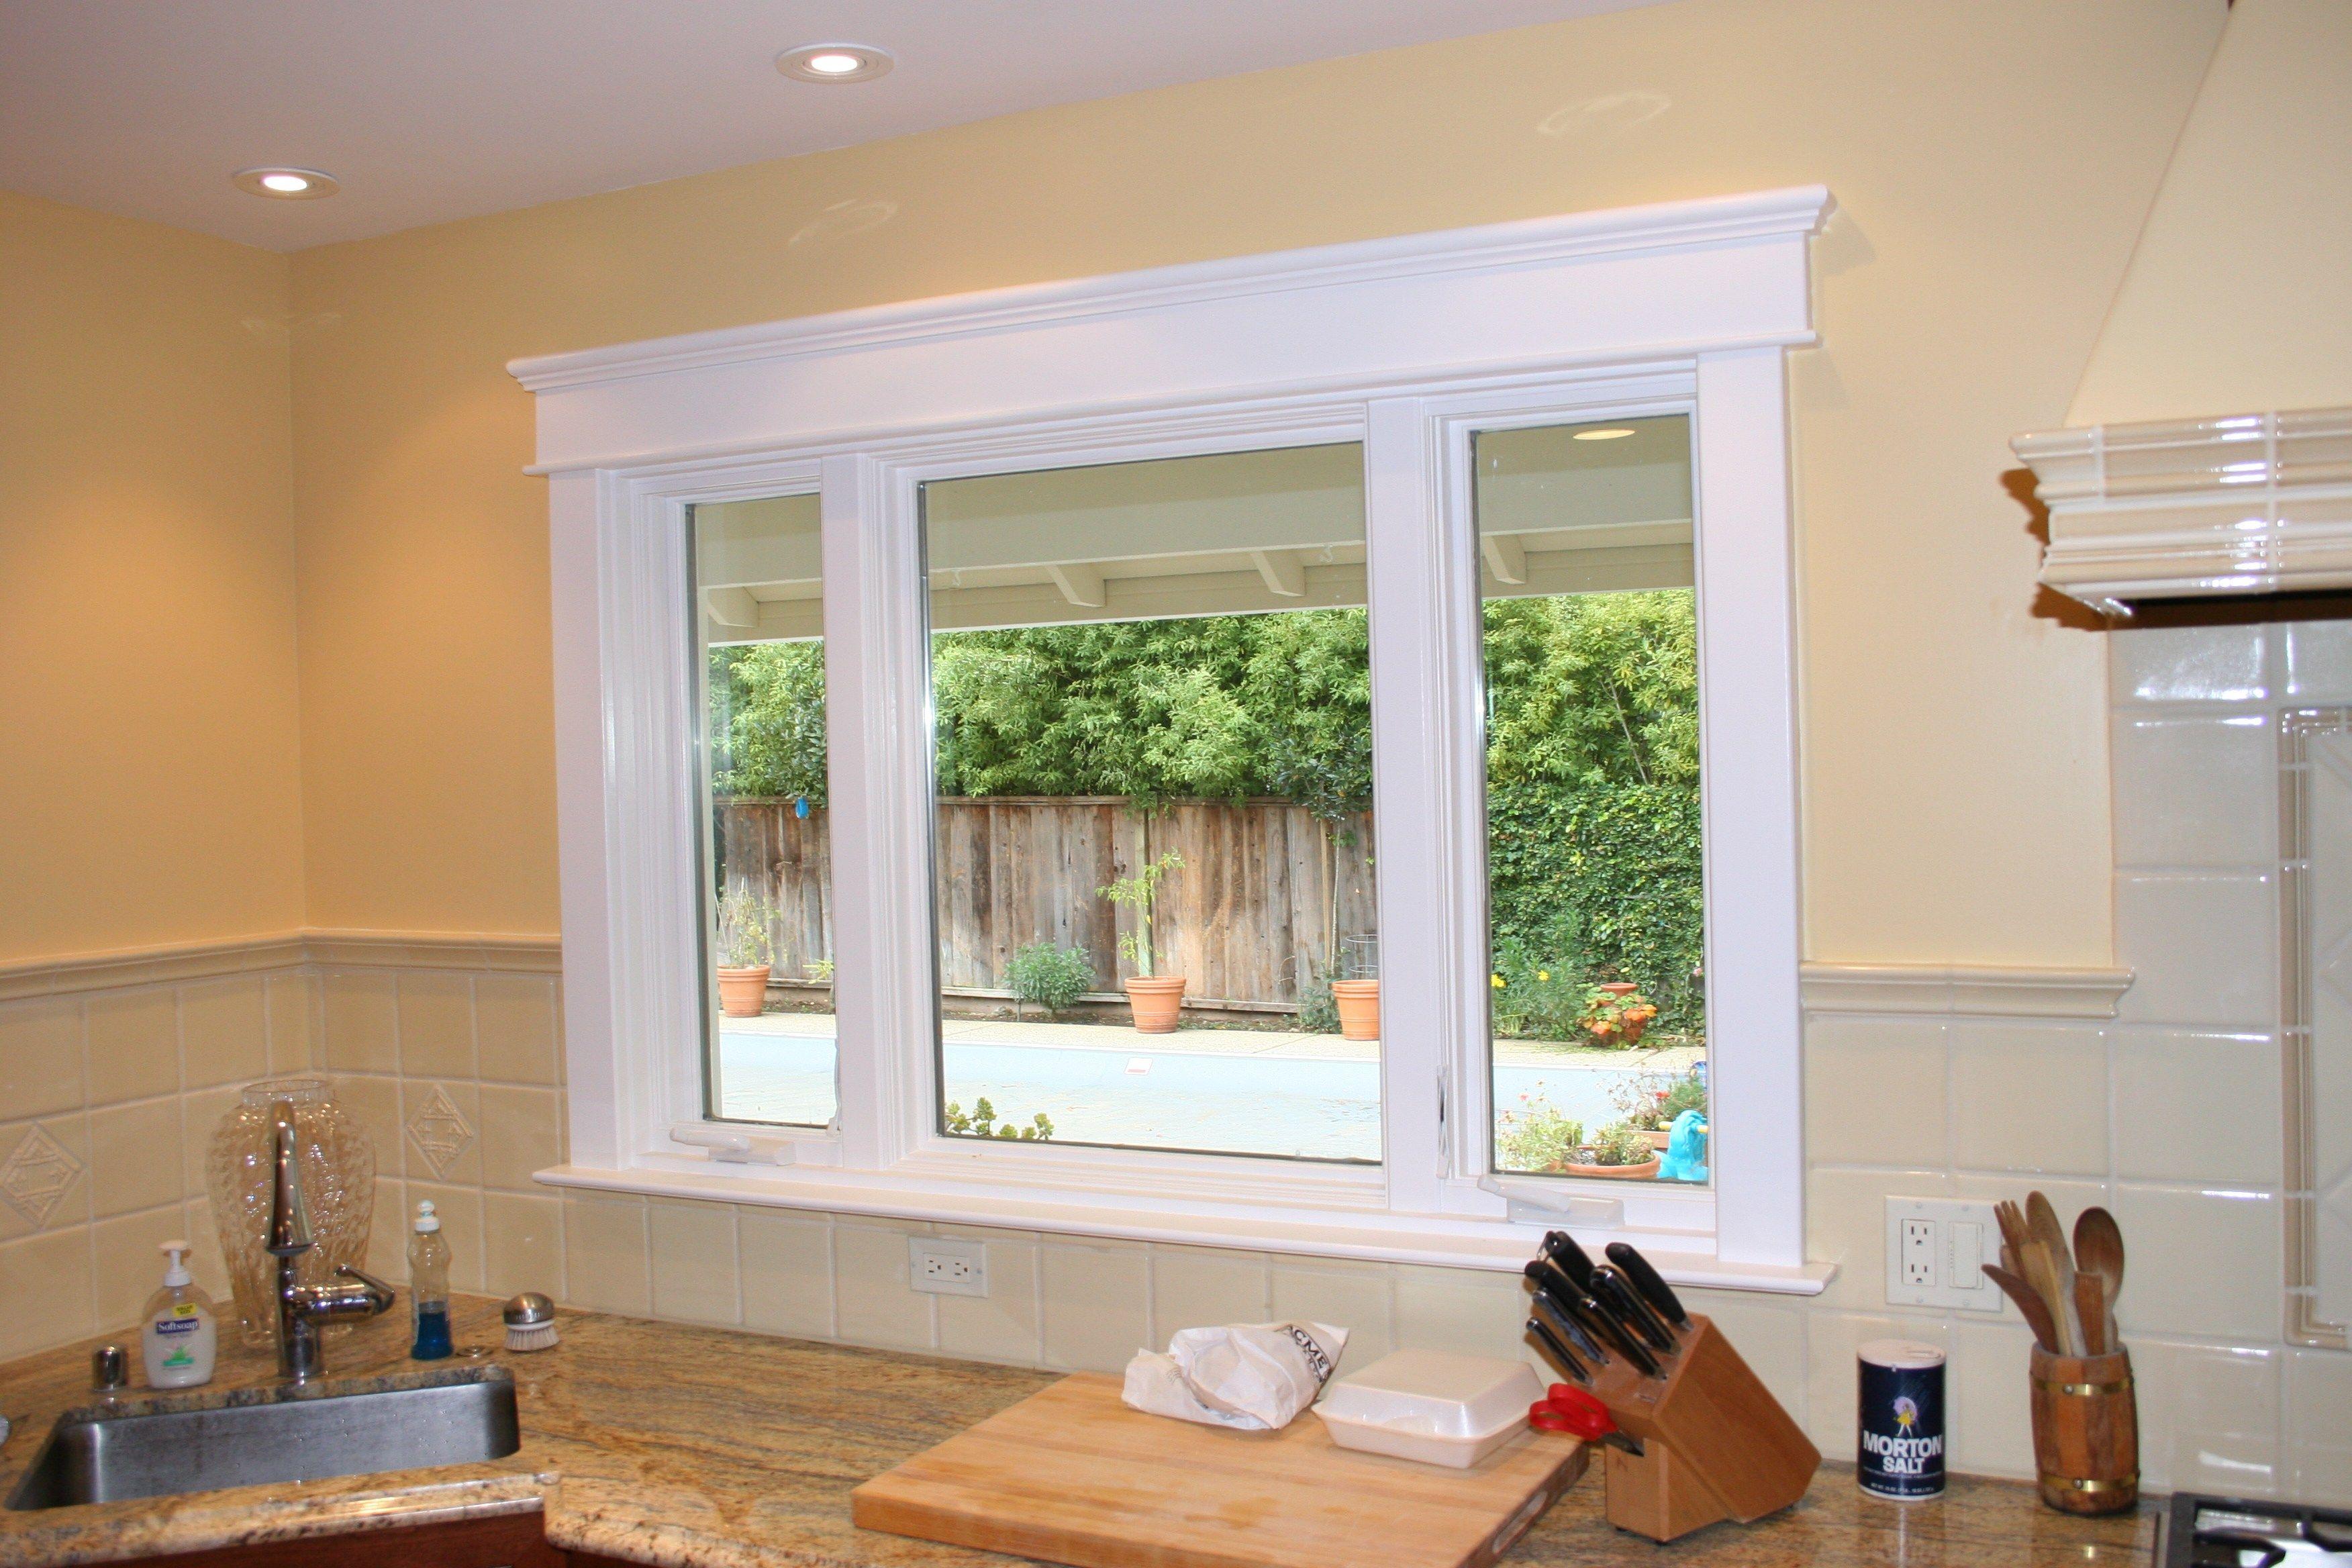 Stunning Window Casing Styles Have Decorative Interior Window Trim